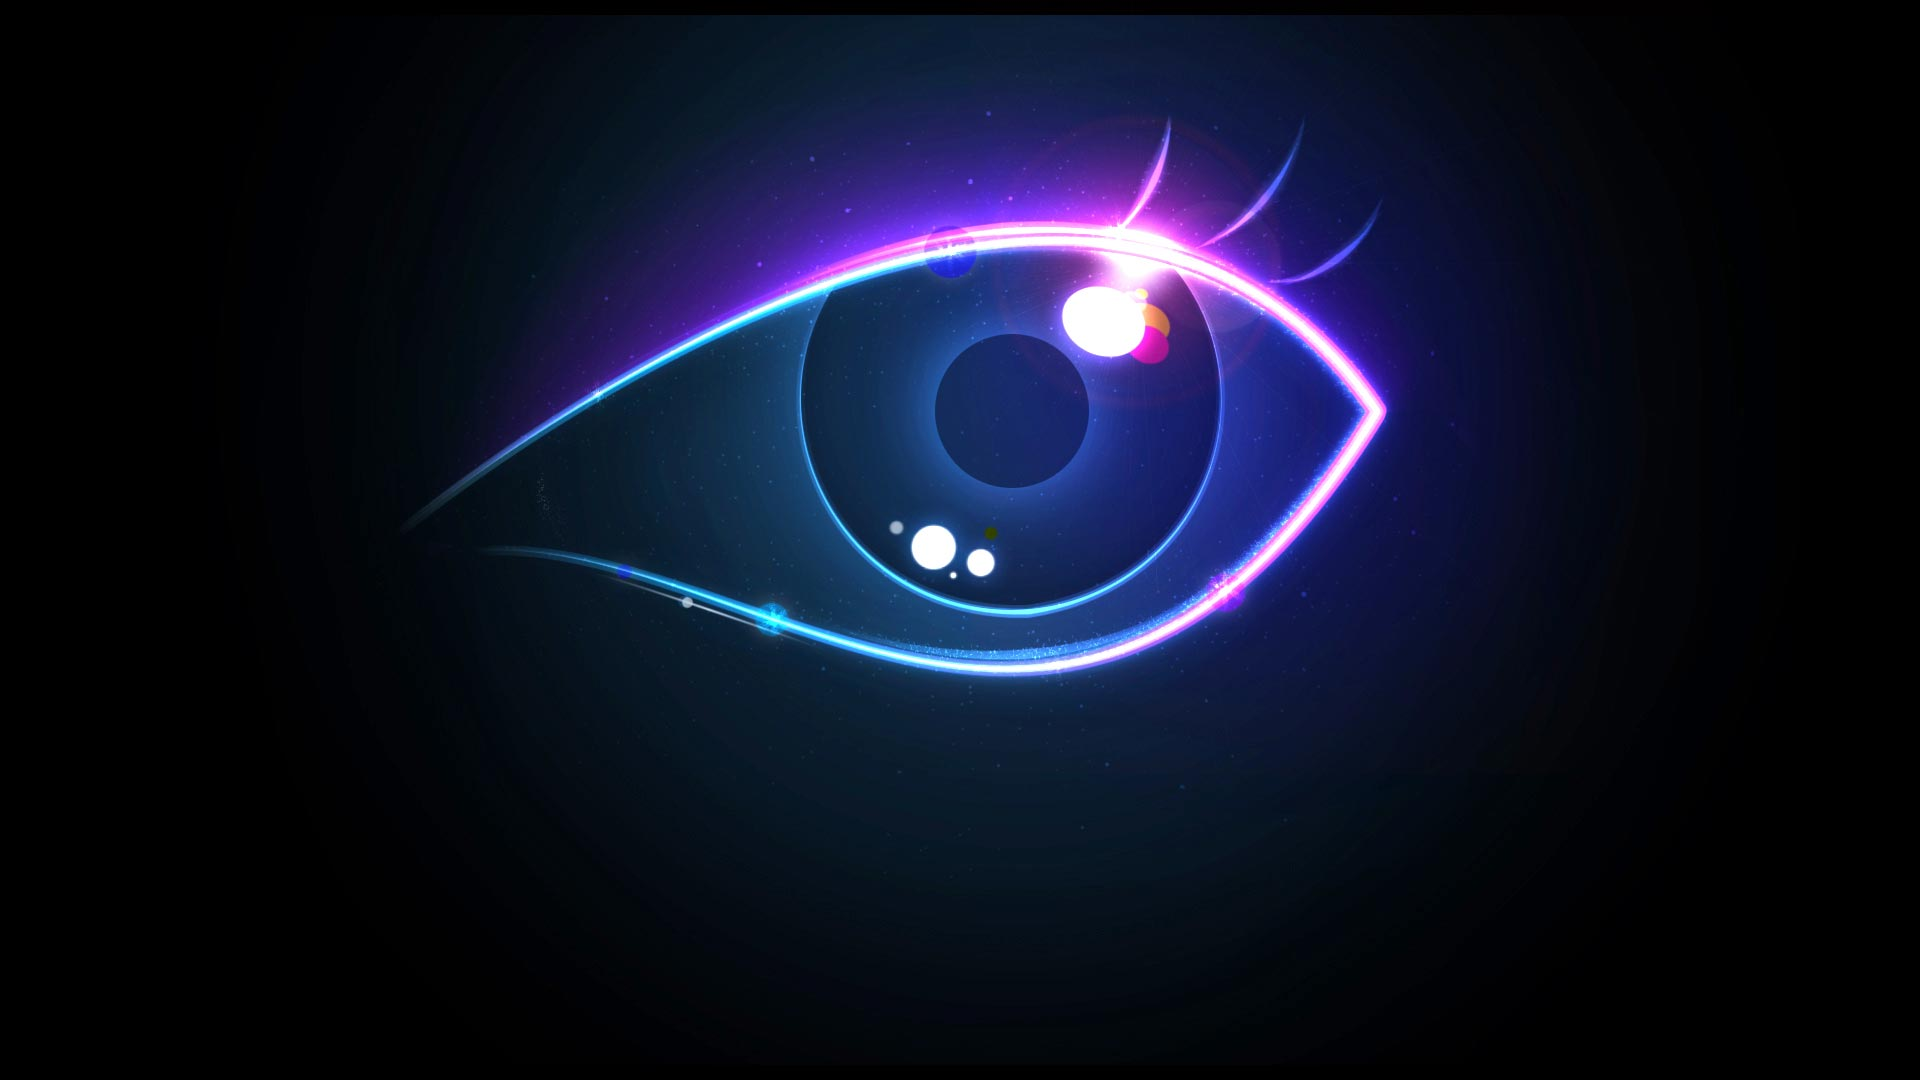 HD All Seeing Eye Wallpaper